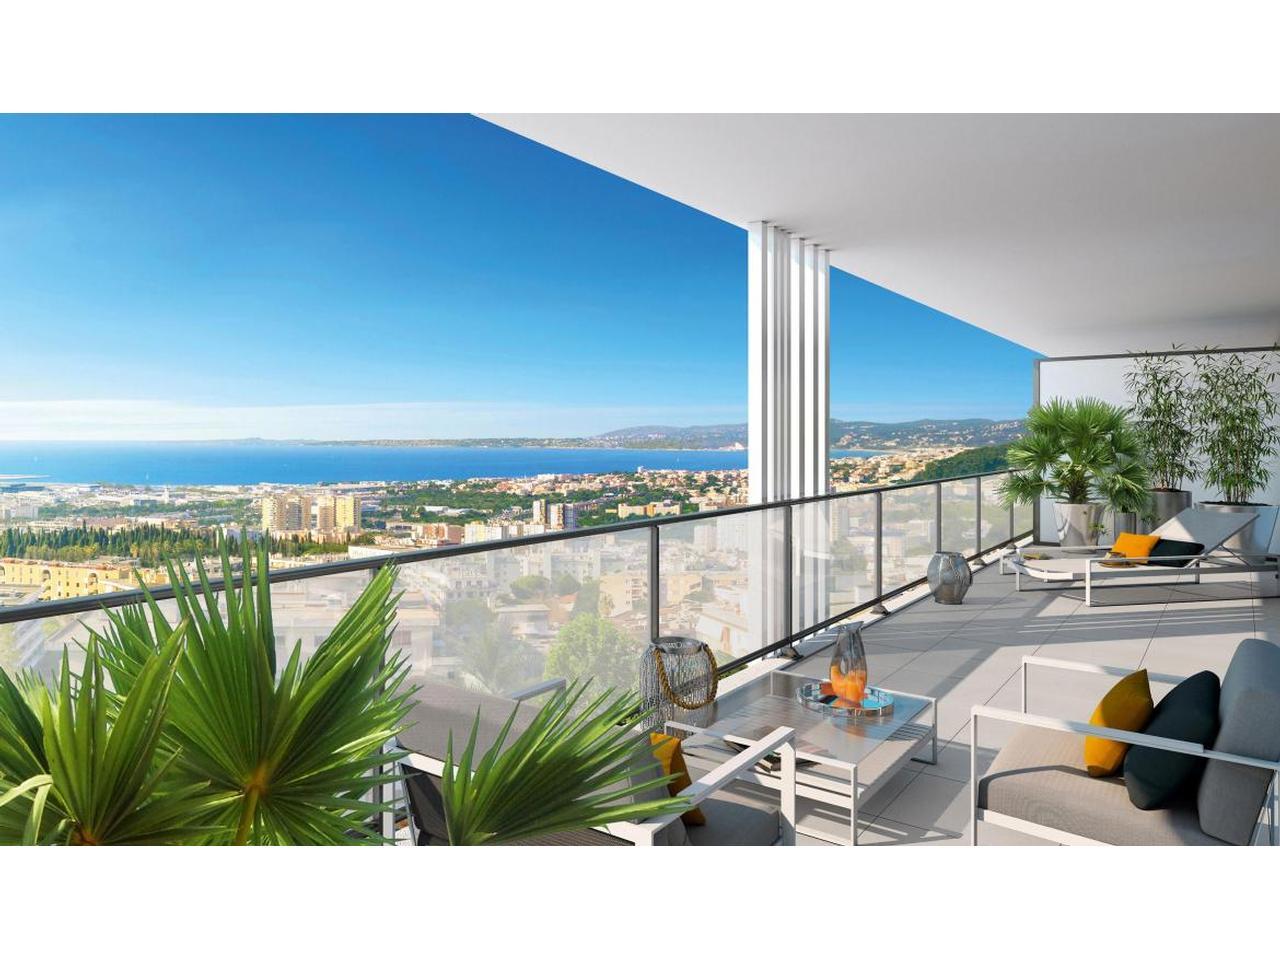 immobilier nice vue mer appartement nice 3 pieces vue mer residence neuve vefa nice ouest. Black Bedroom Furniture Sets. Home Design Ideas